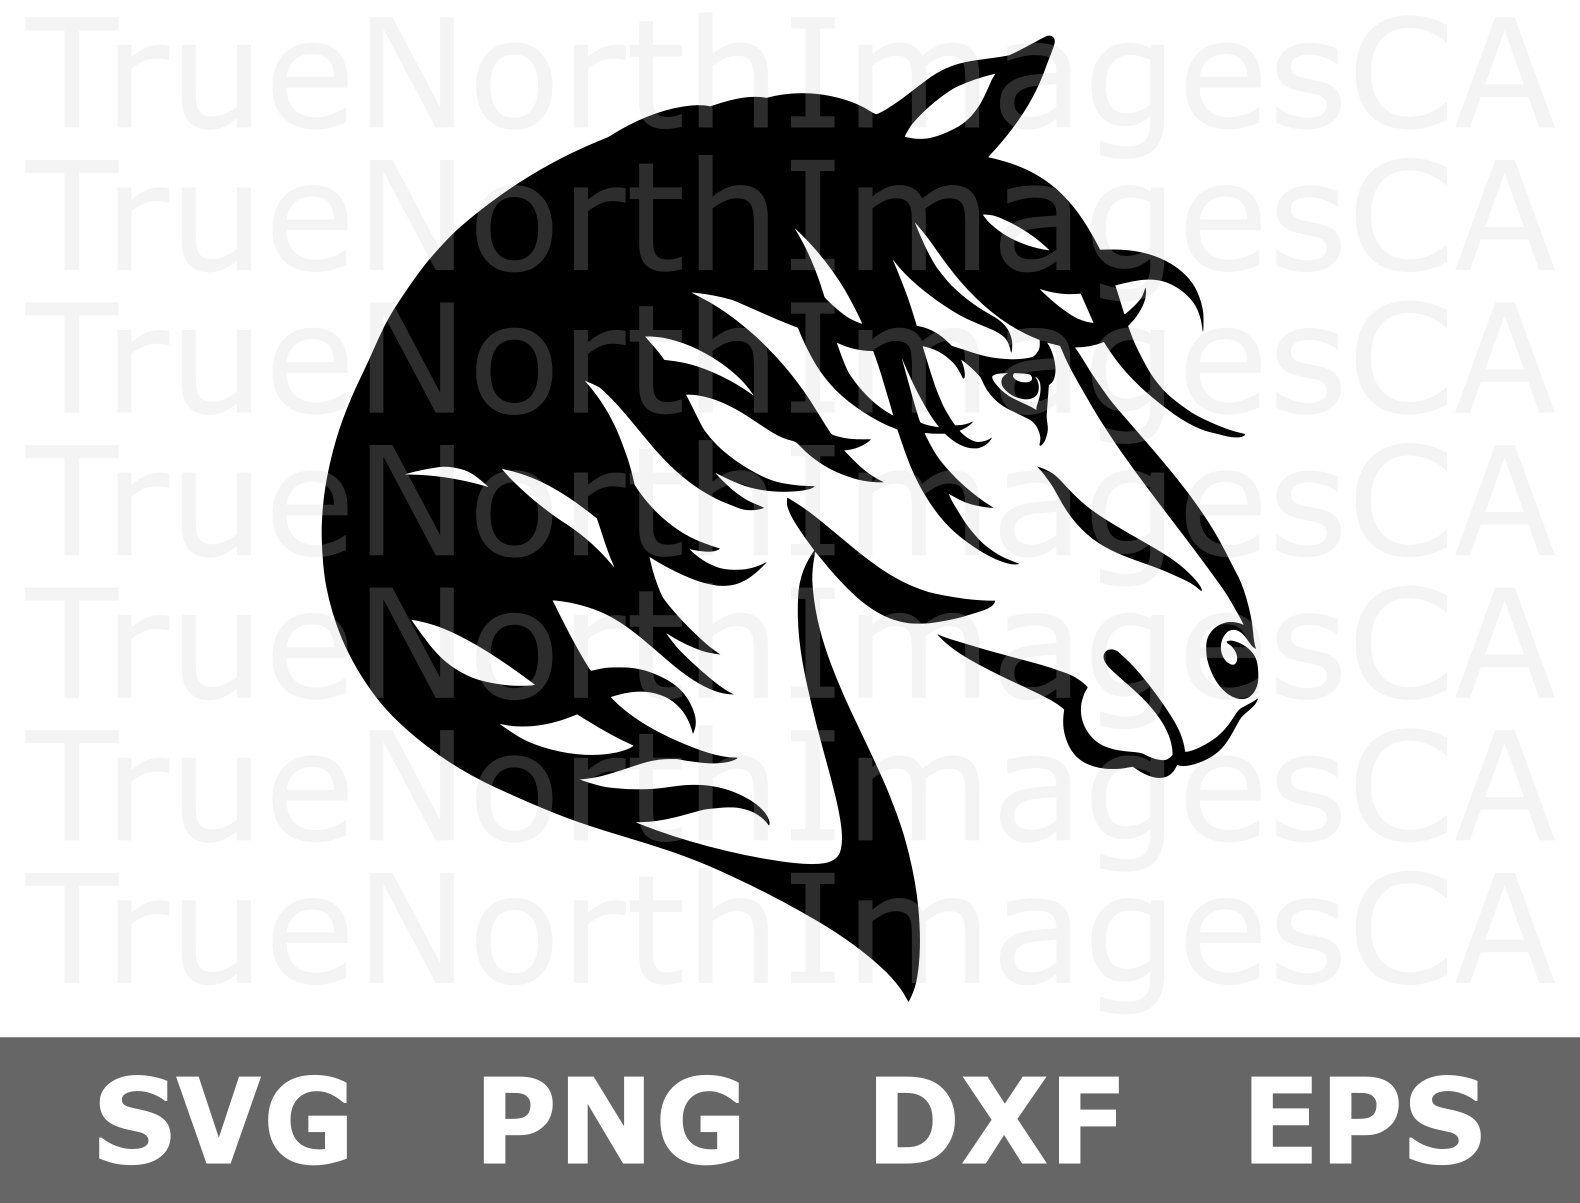 Horse clipart file. Svg silhouette cut